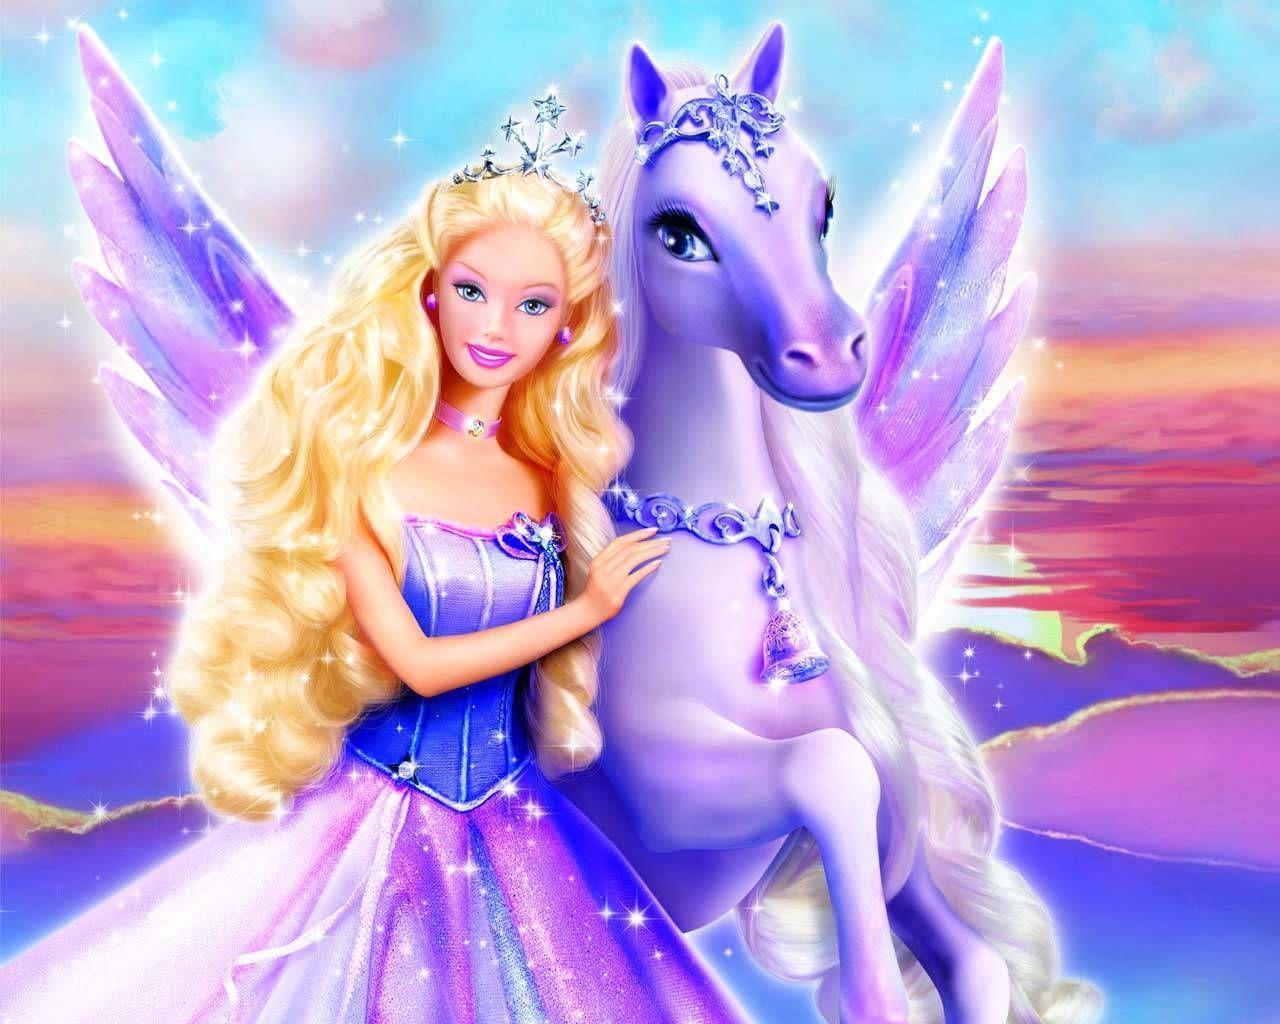 Barbie S Magical Malibu Dollhouse Should Be Bulldozed One